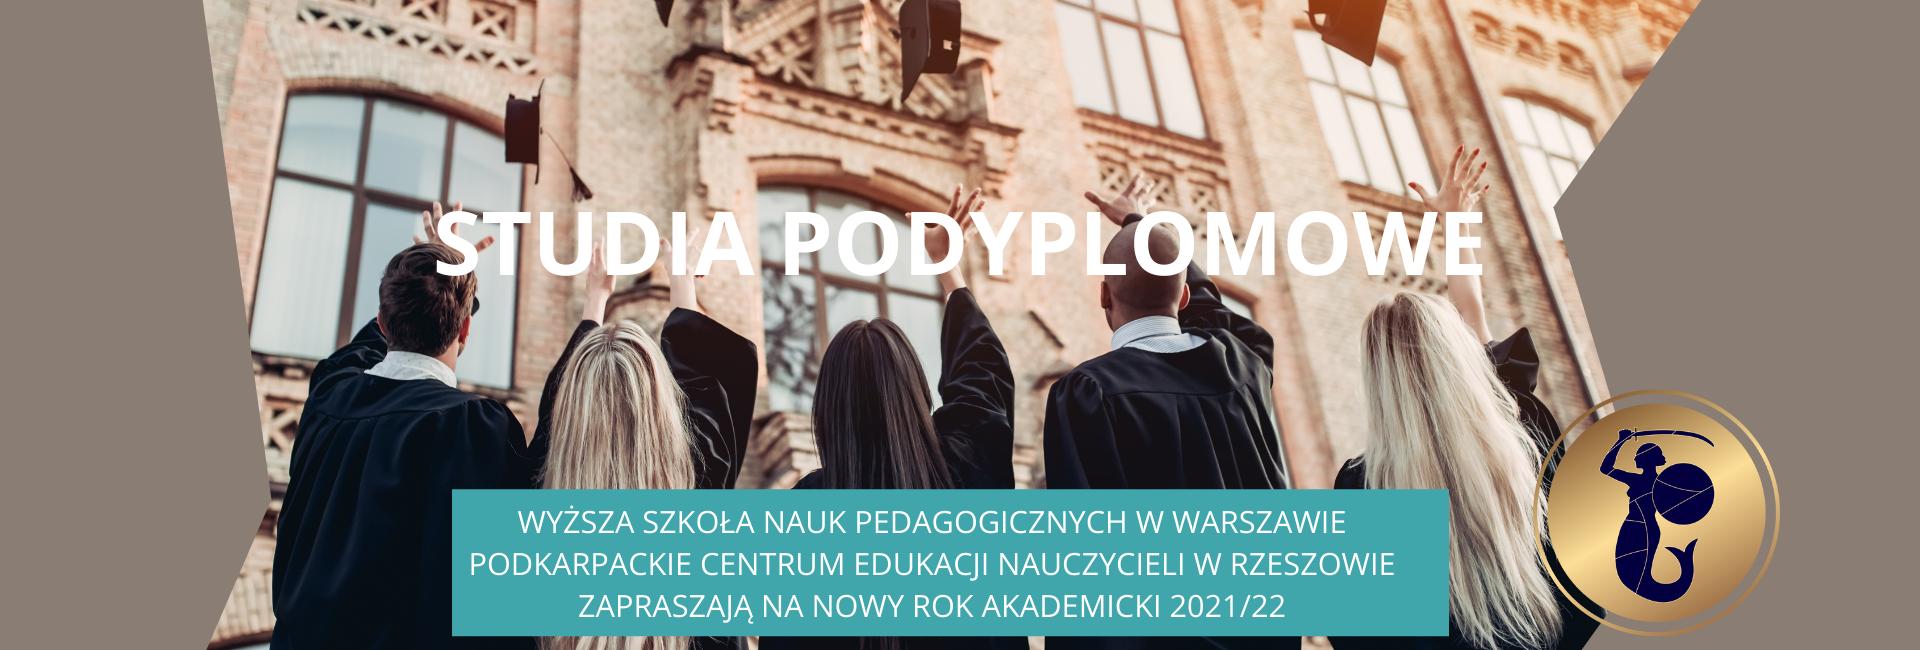 STUDIA_PODYPLOMOWE